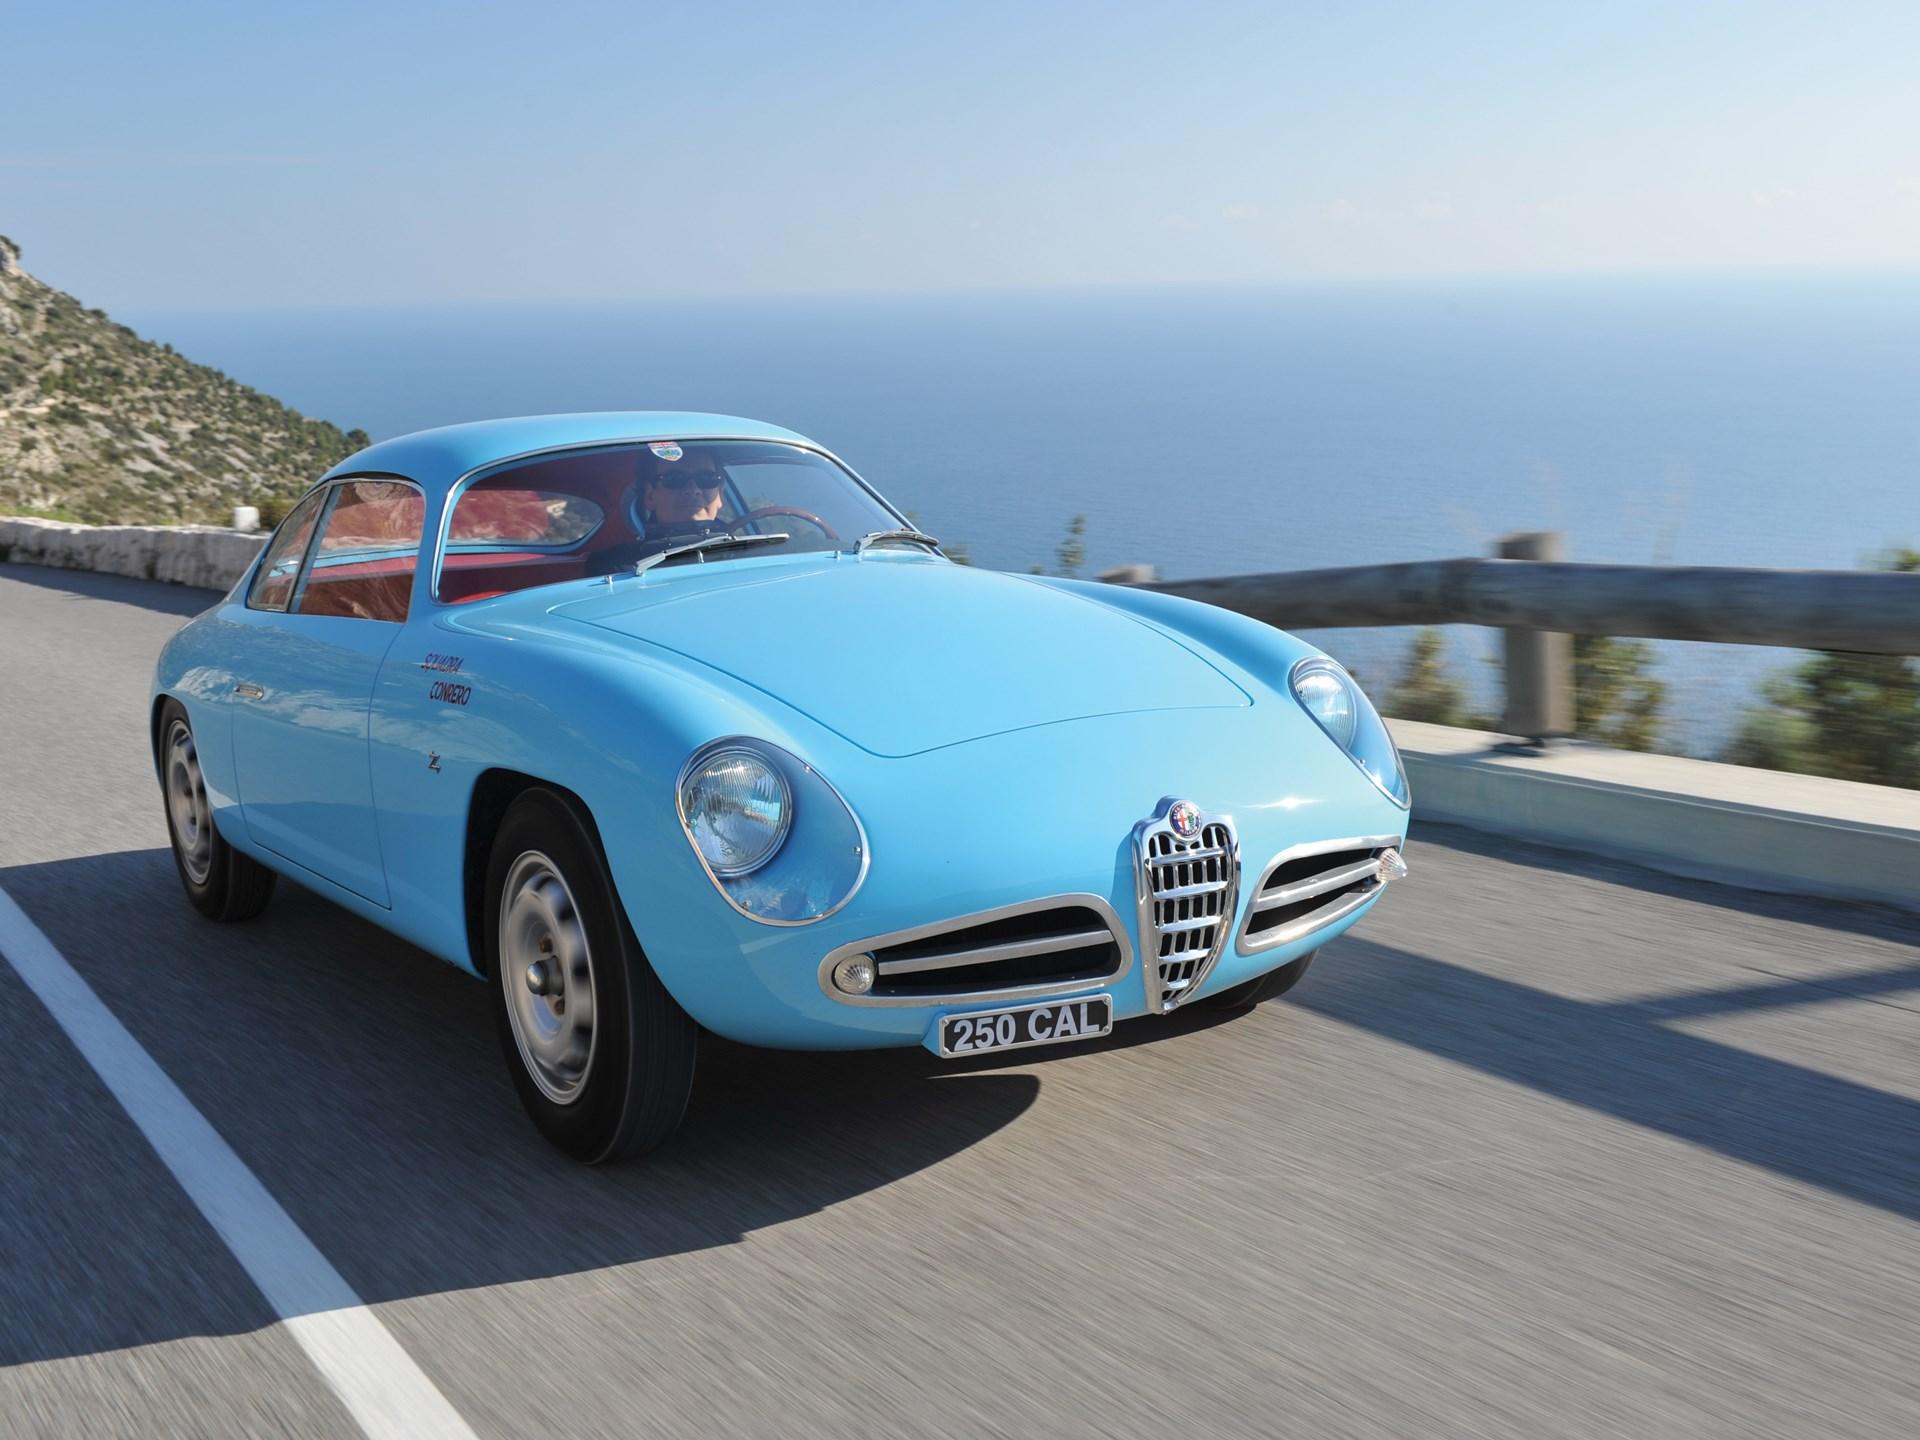 Alfa Romeo Giulietta Sprint Veloce Zagato 1958 rmsotheby\\\'s  b1b69c87306302c0988be7c92ed3f2f3b8c906ba